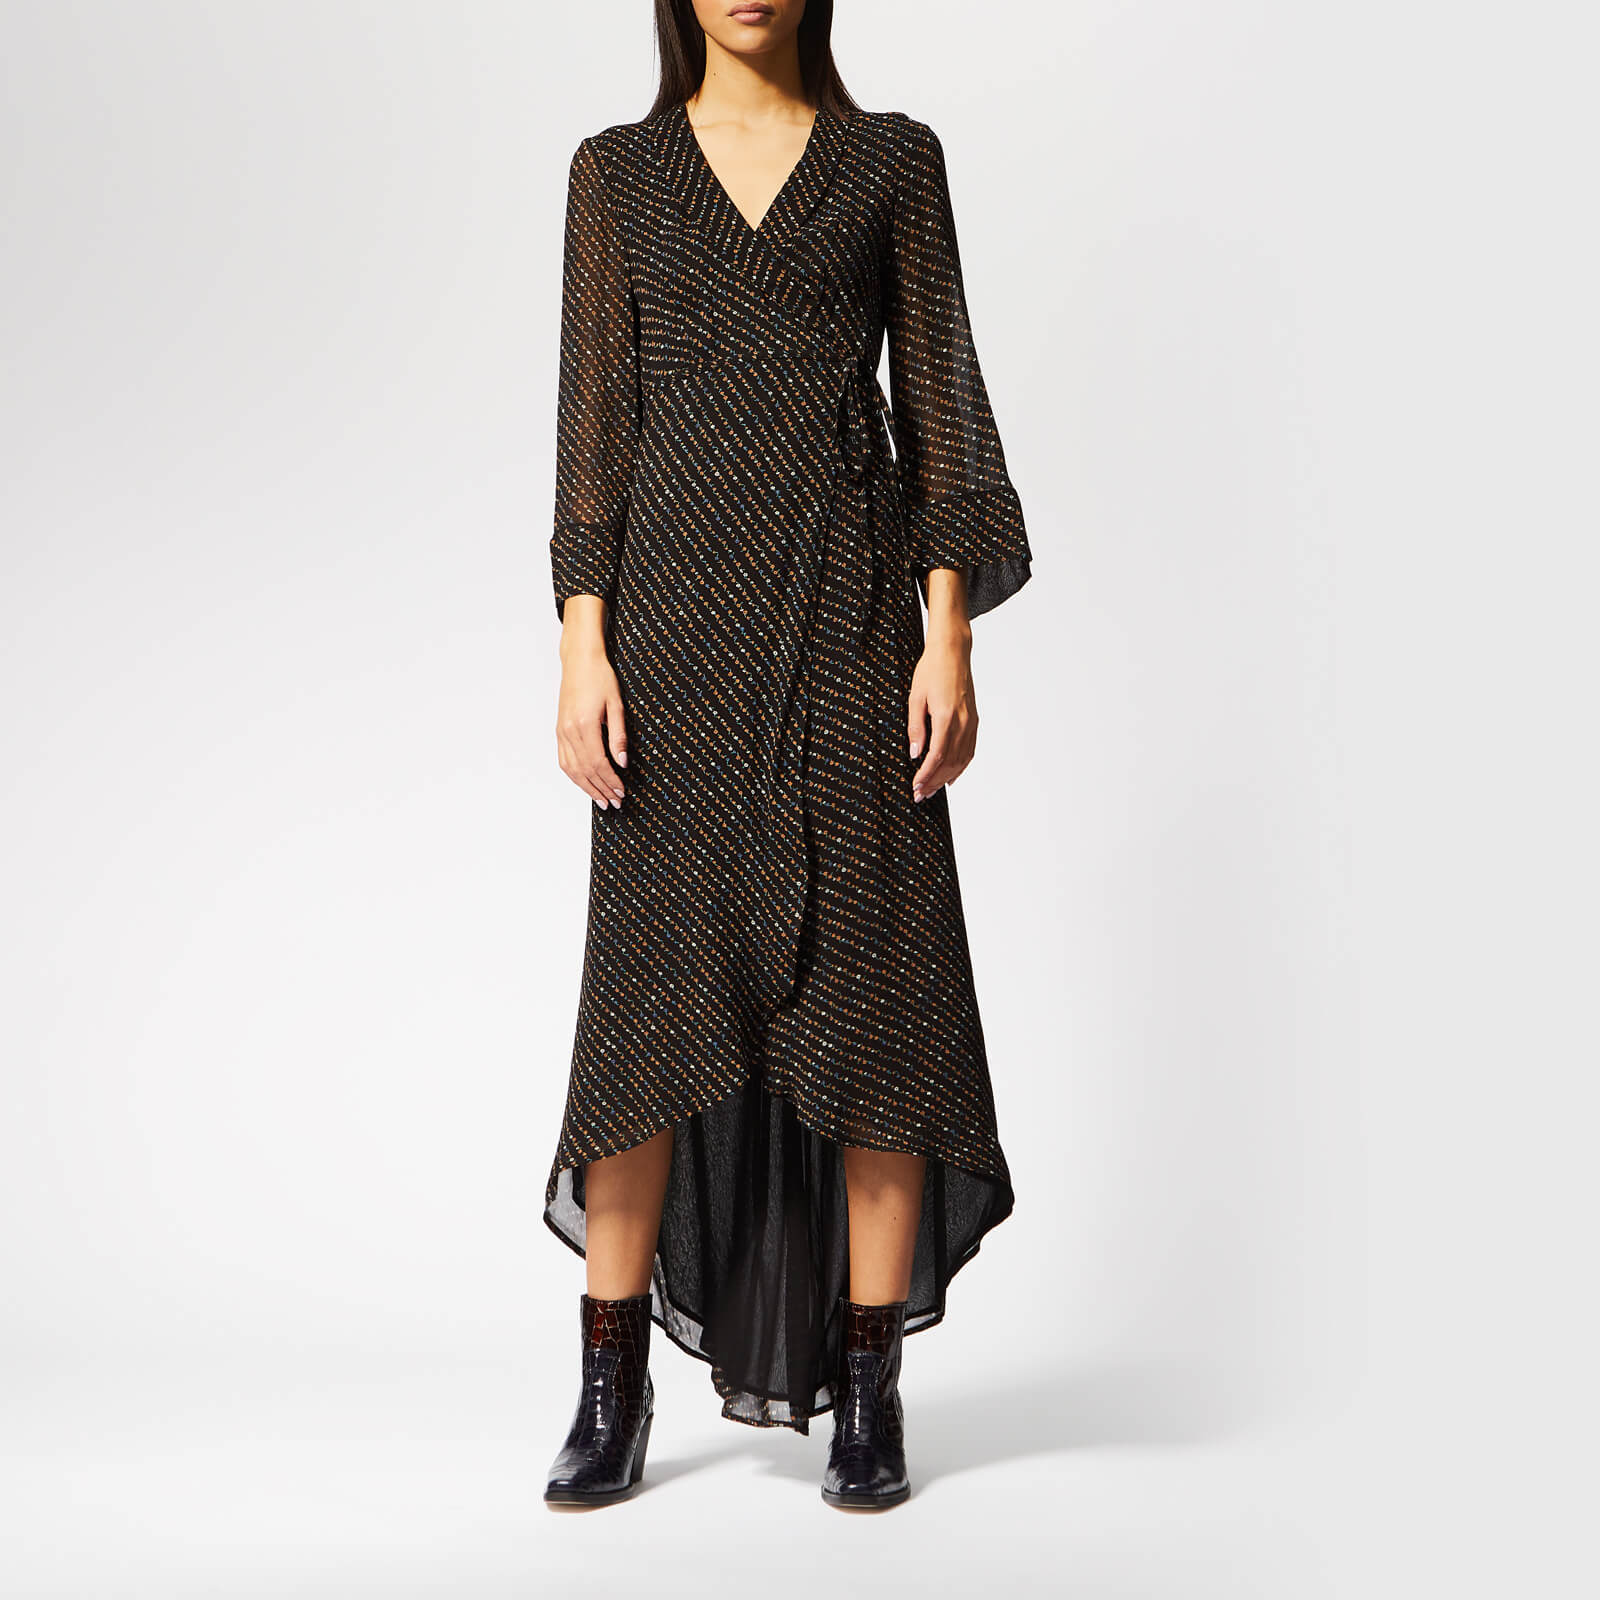 best supplier 50% price best cheap Ganni Women's Mullin Georgette Wrap Dress - Black